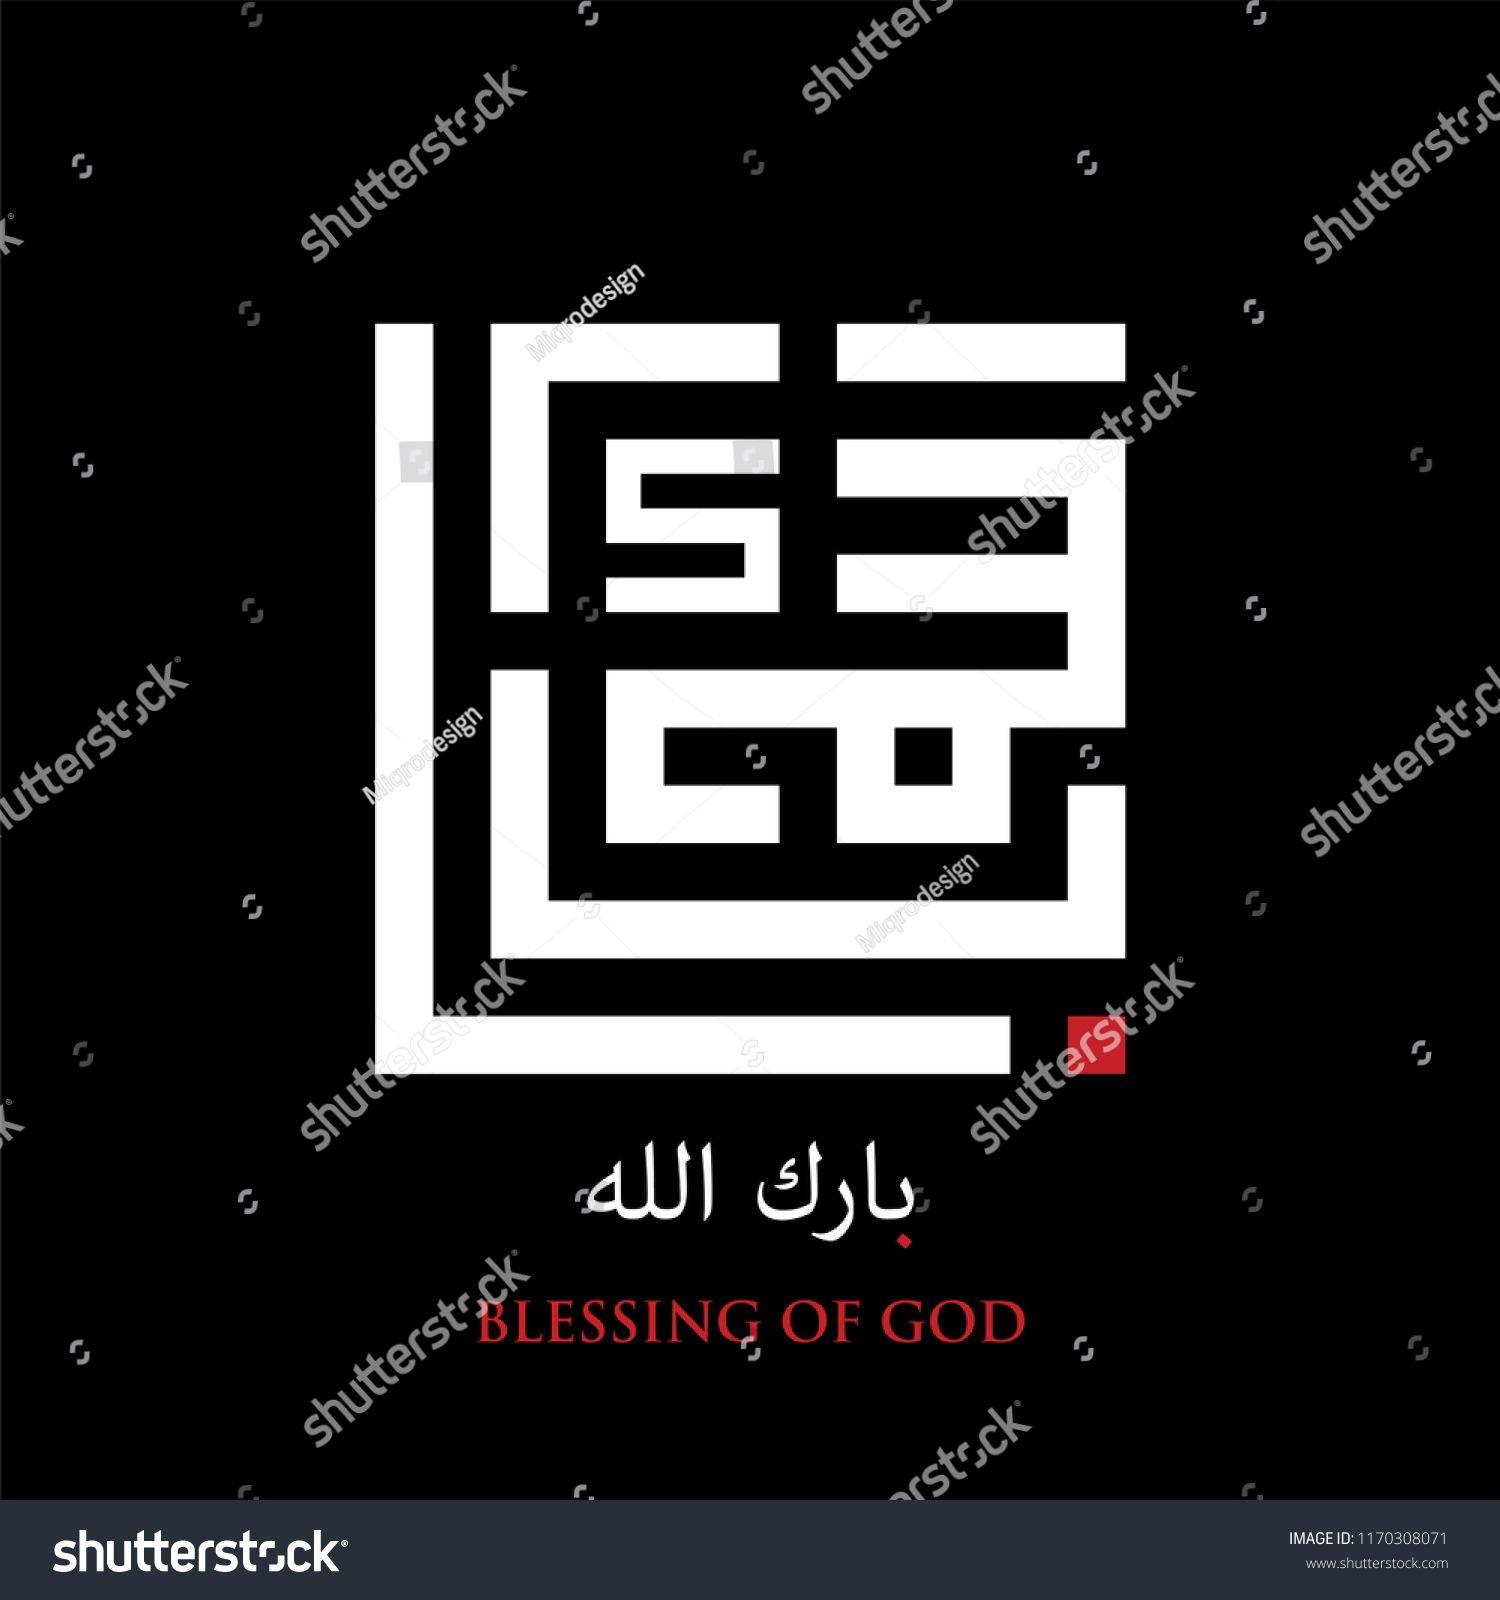 Islamic Square Kufi Calligraphy Of Barakallah Blessing Of God Calligraphy Design Islam Calligraphy